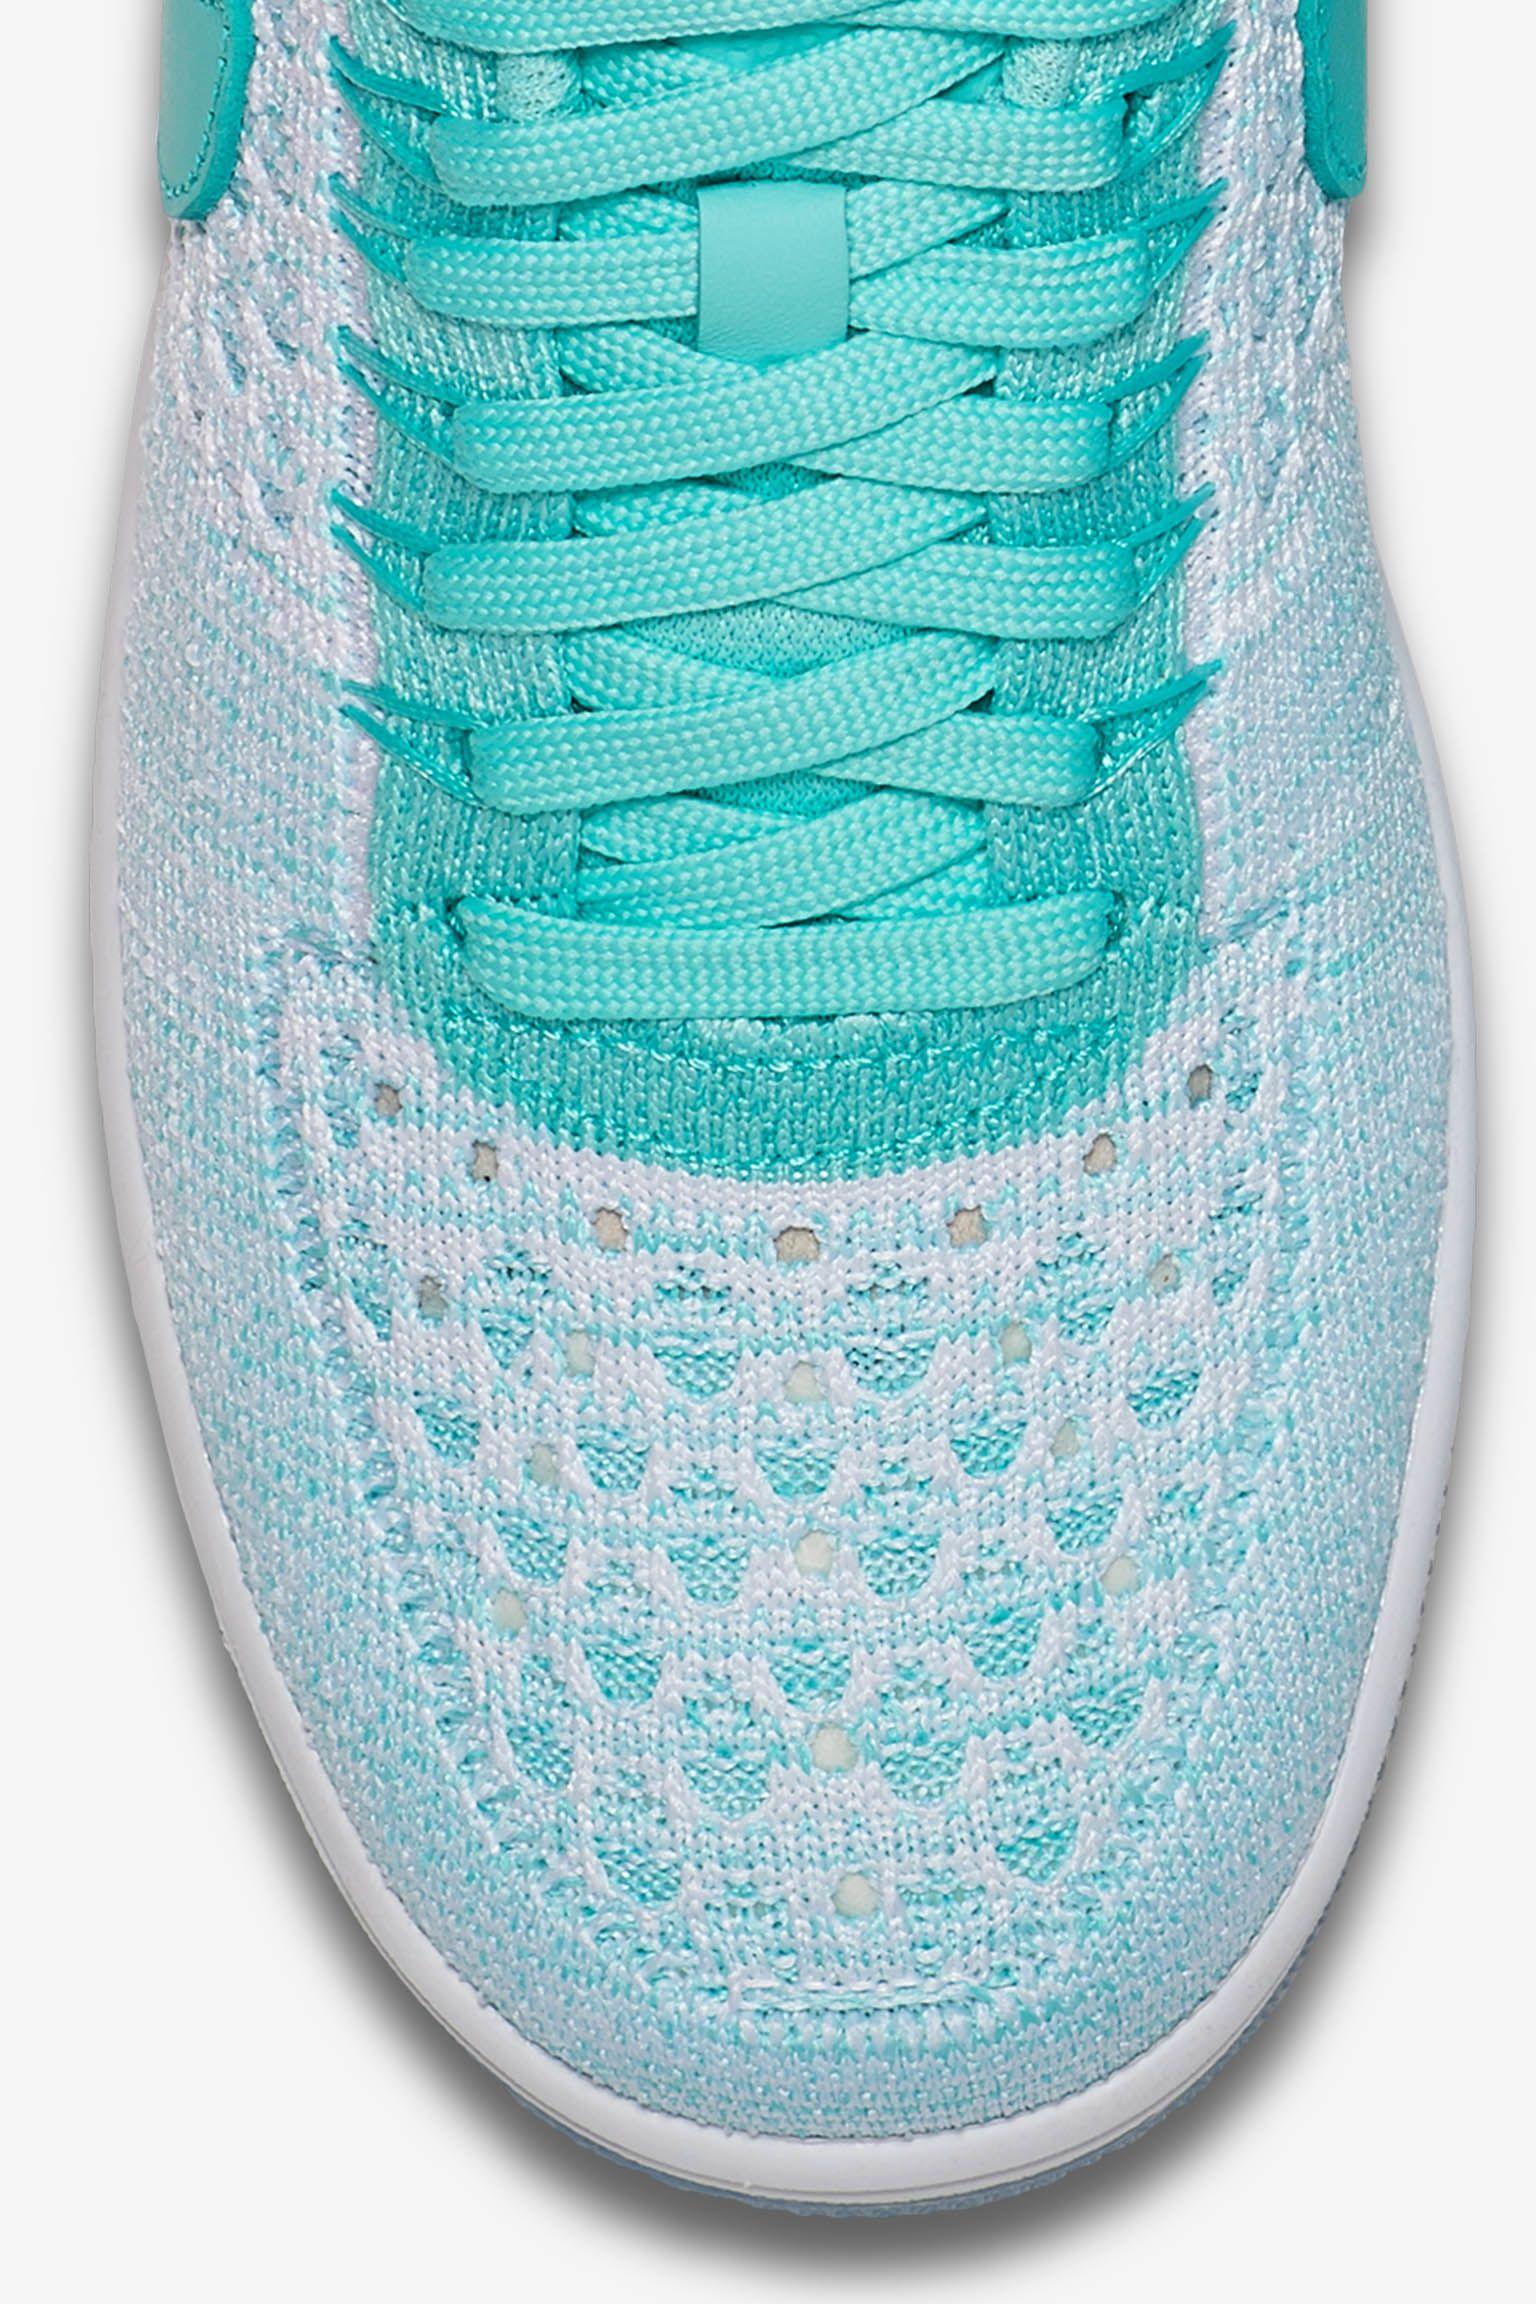 Women's Nike Air Force 1 Ultra Flyknit Low 'Hyper Turquoise'